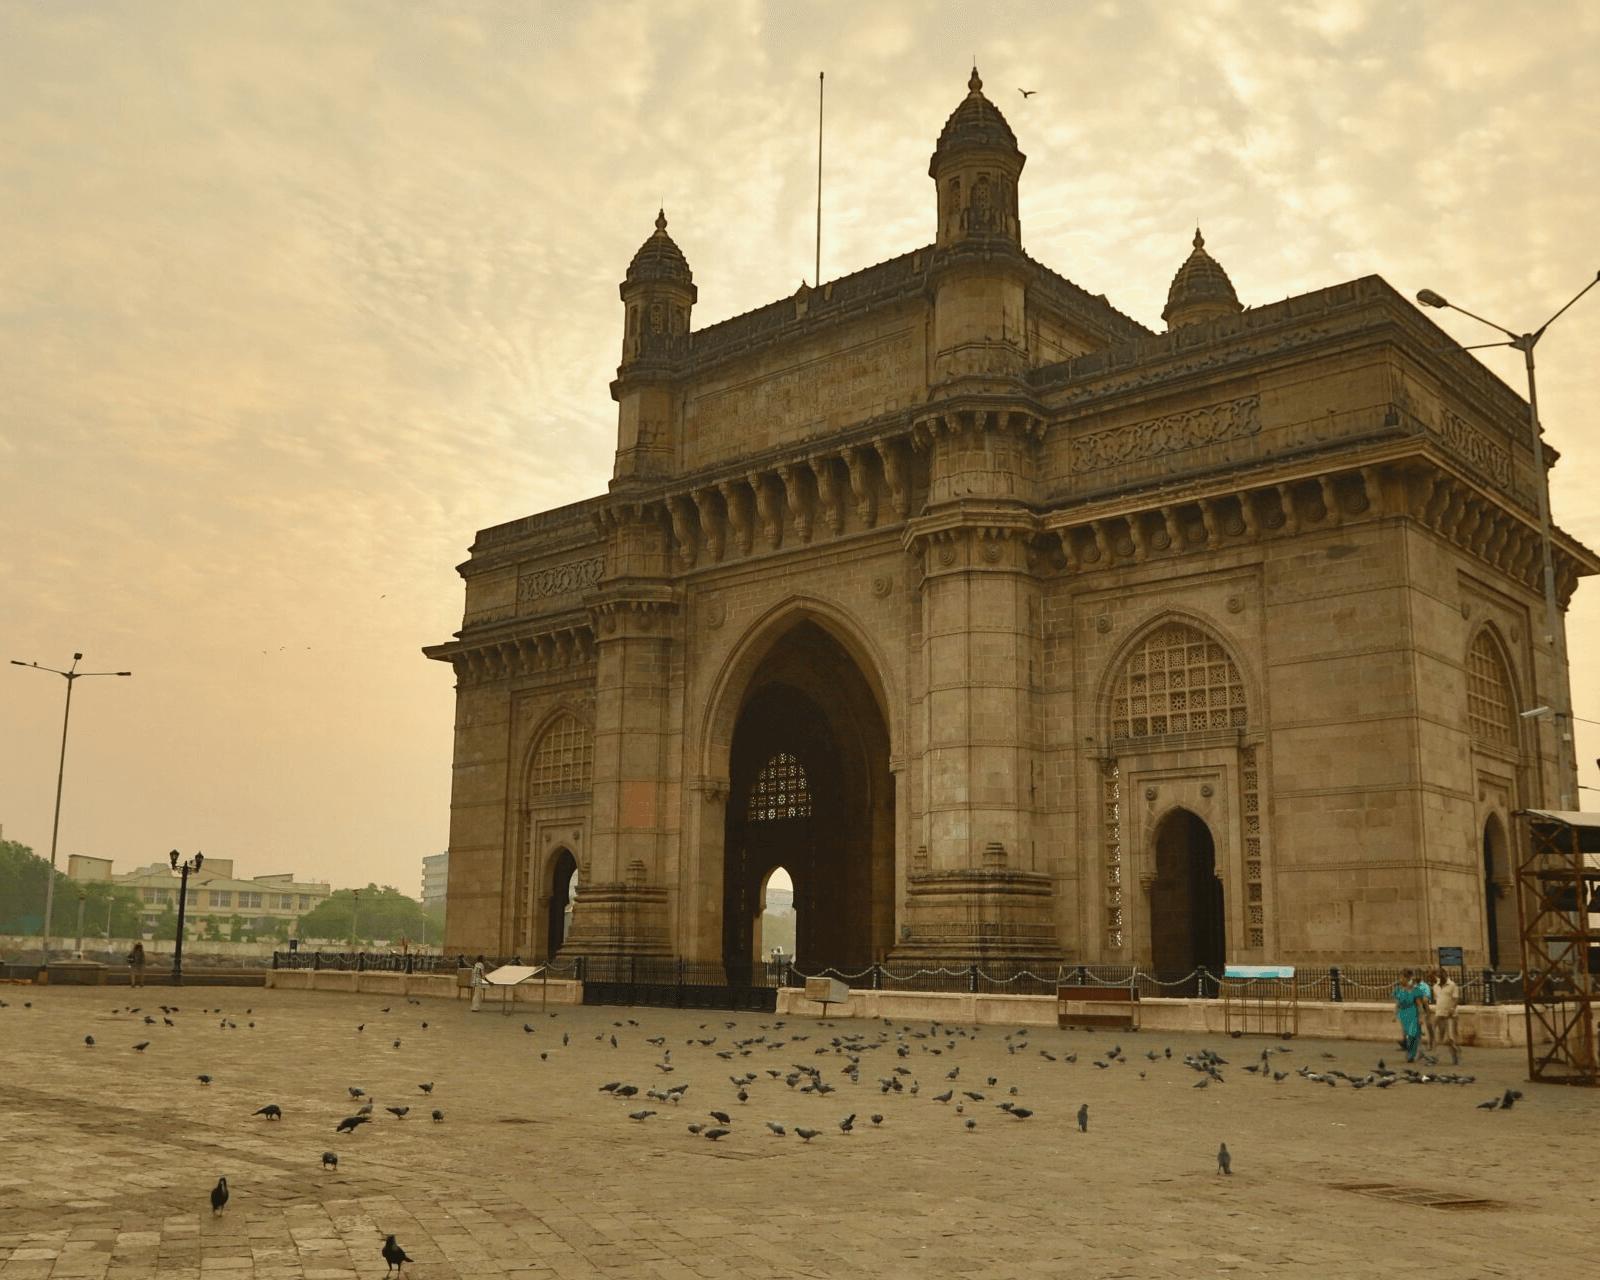 From Mumbai